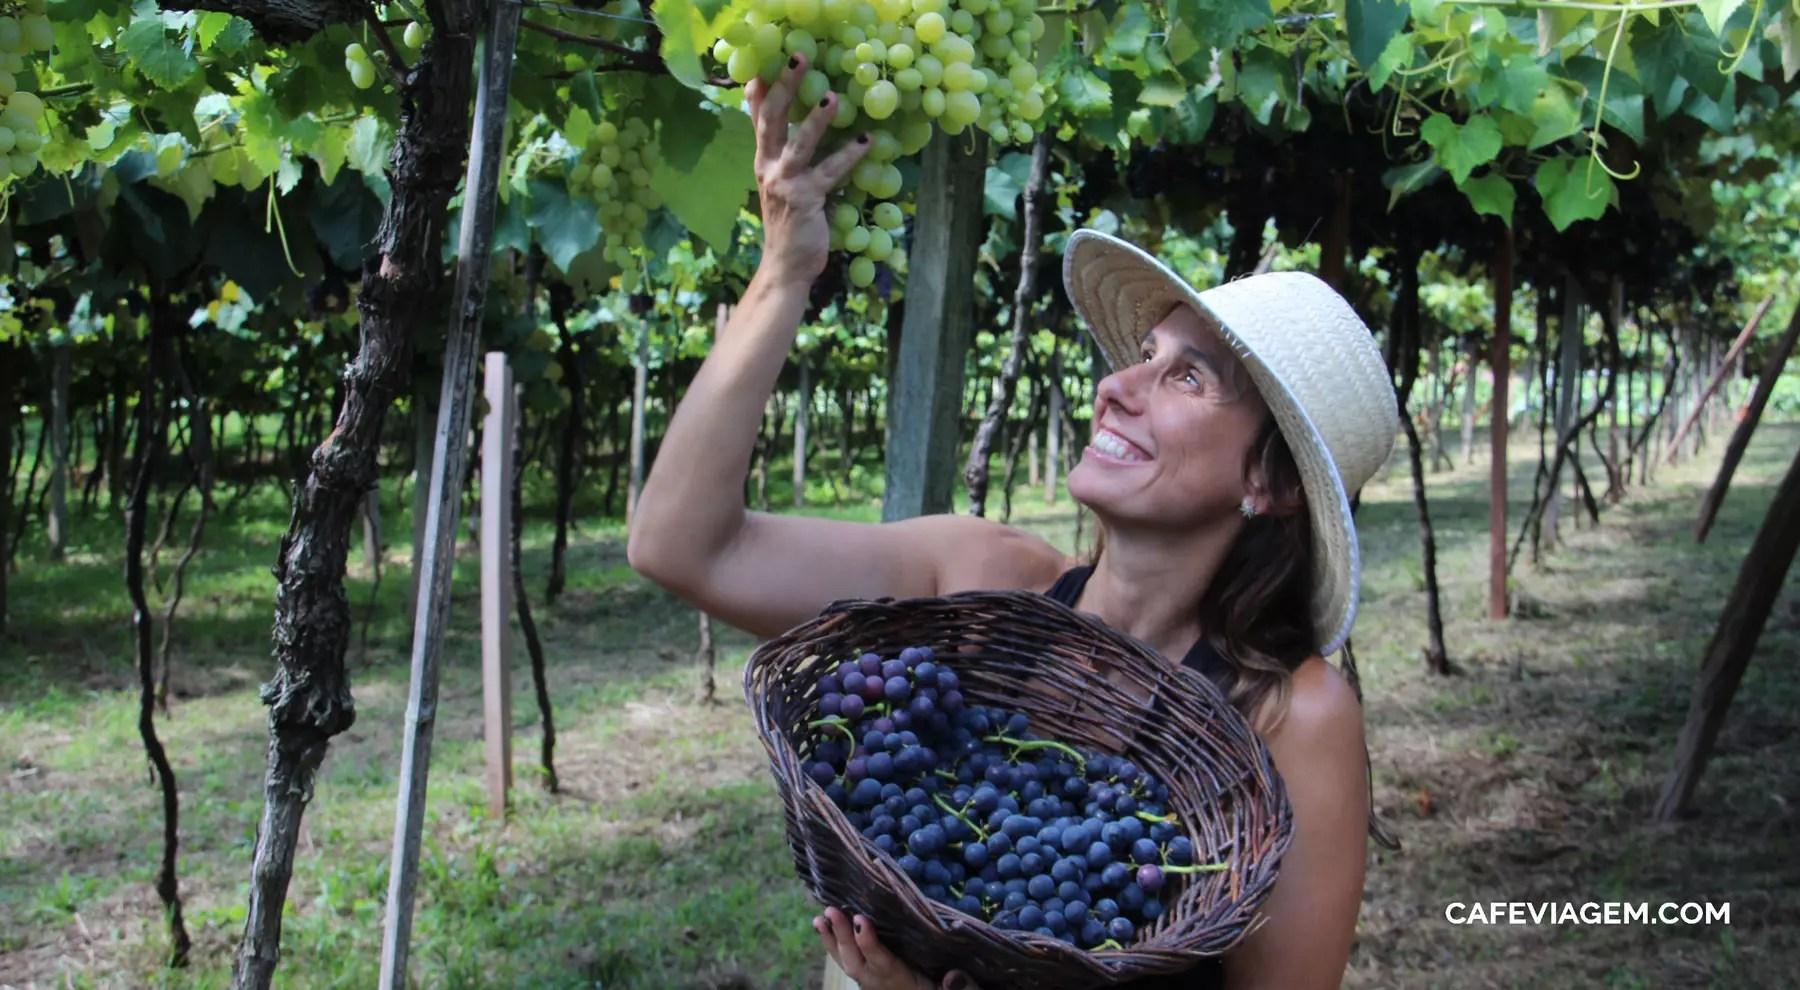 pisa e colheita da uva Vindima serra gaúcha